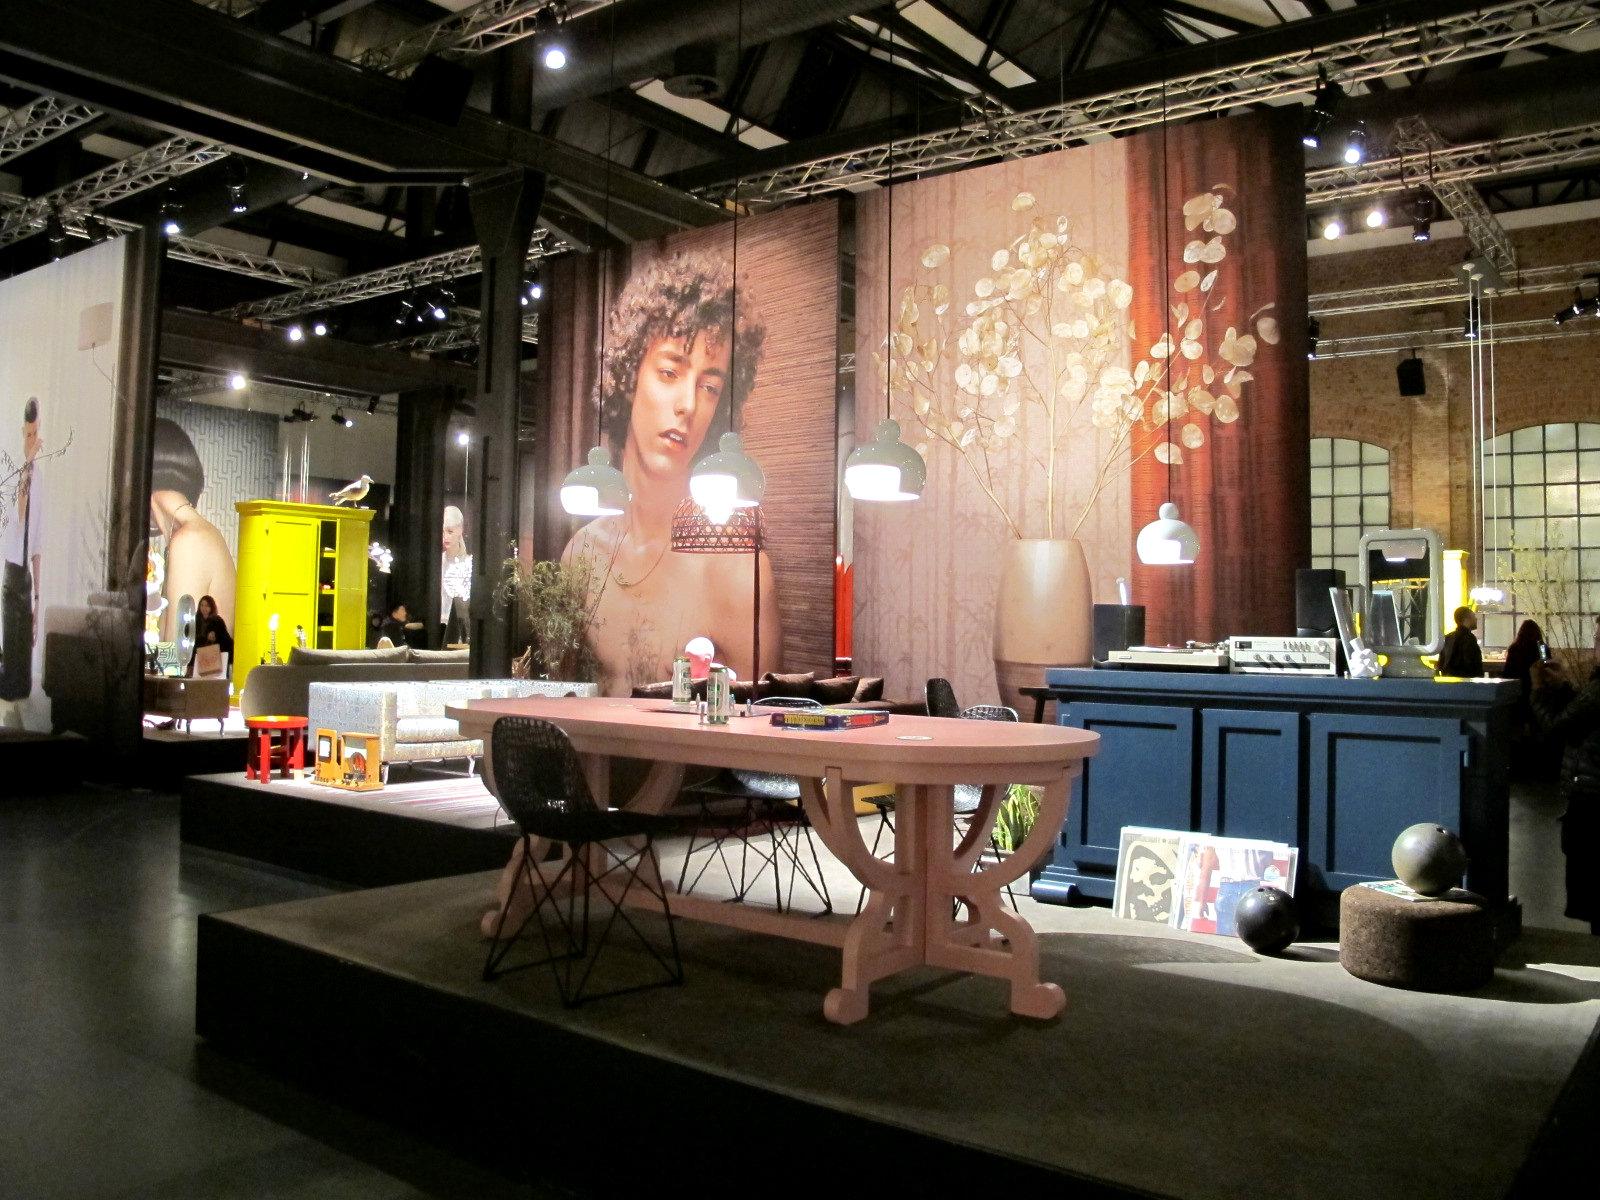 Salone del mobile 2013 (2), gloire aux armoires!